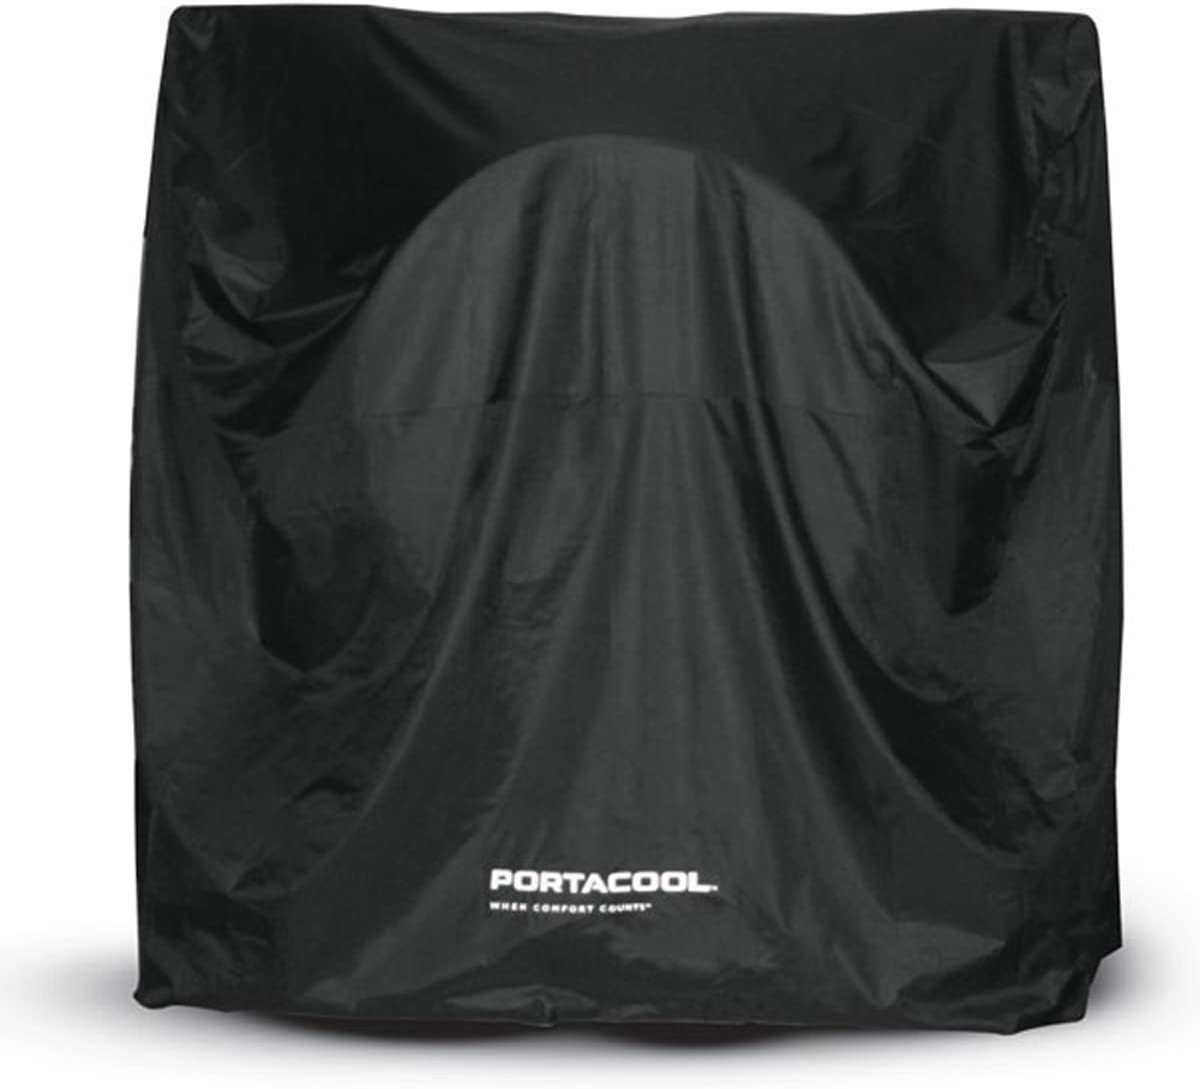 Portacool PARCVRH37000 Replacement Protective Cover for Hurricane 370 Portable Evaporative Cooler, Black